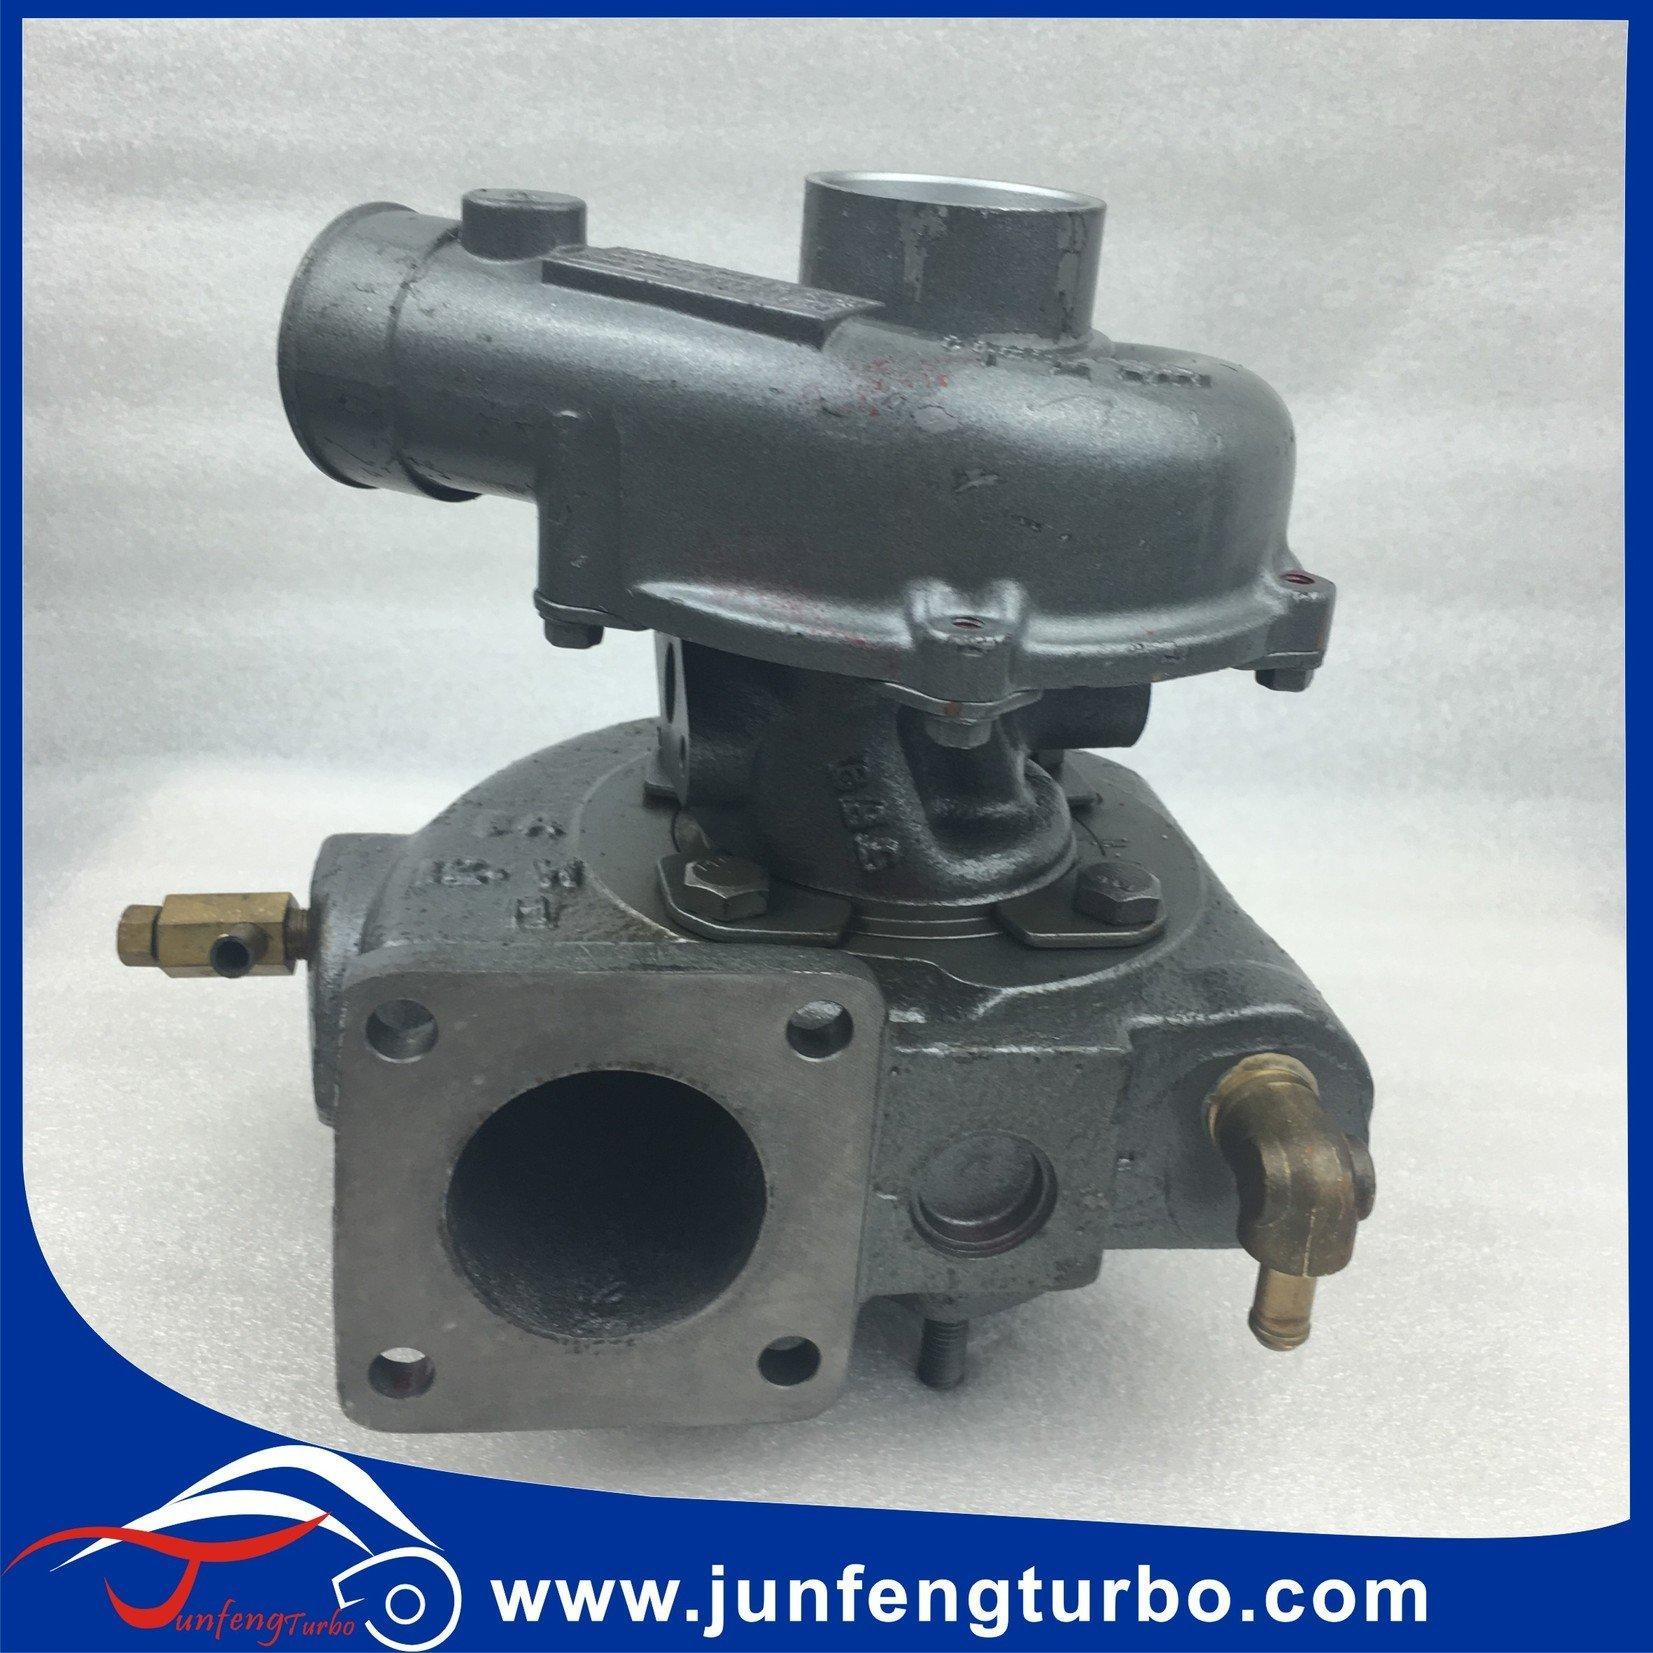 YANMAR RHB5 Turbo VA190052 129671-18010 turbocharger 4JH4-TE engine